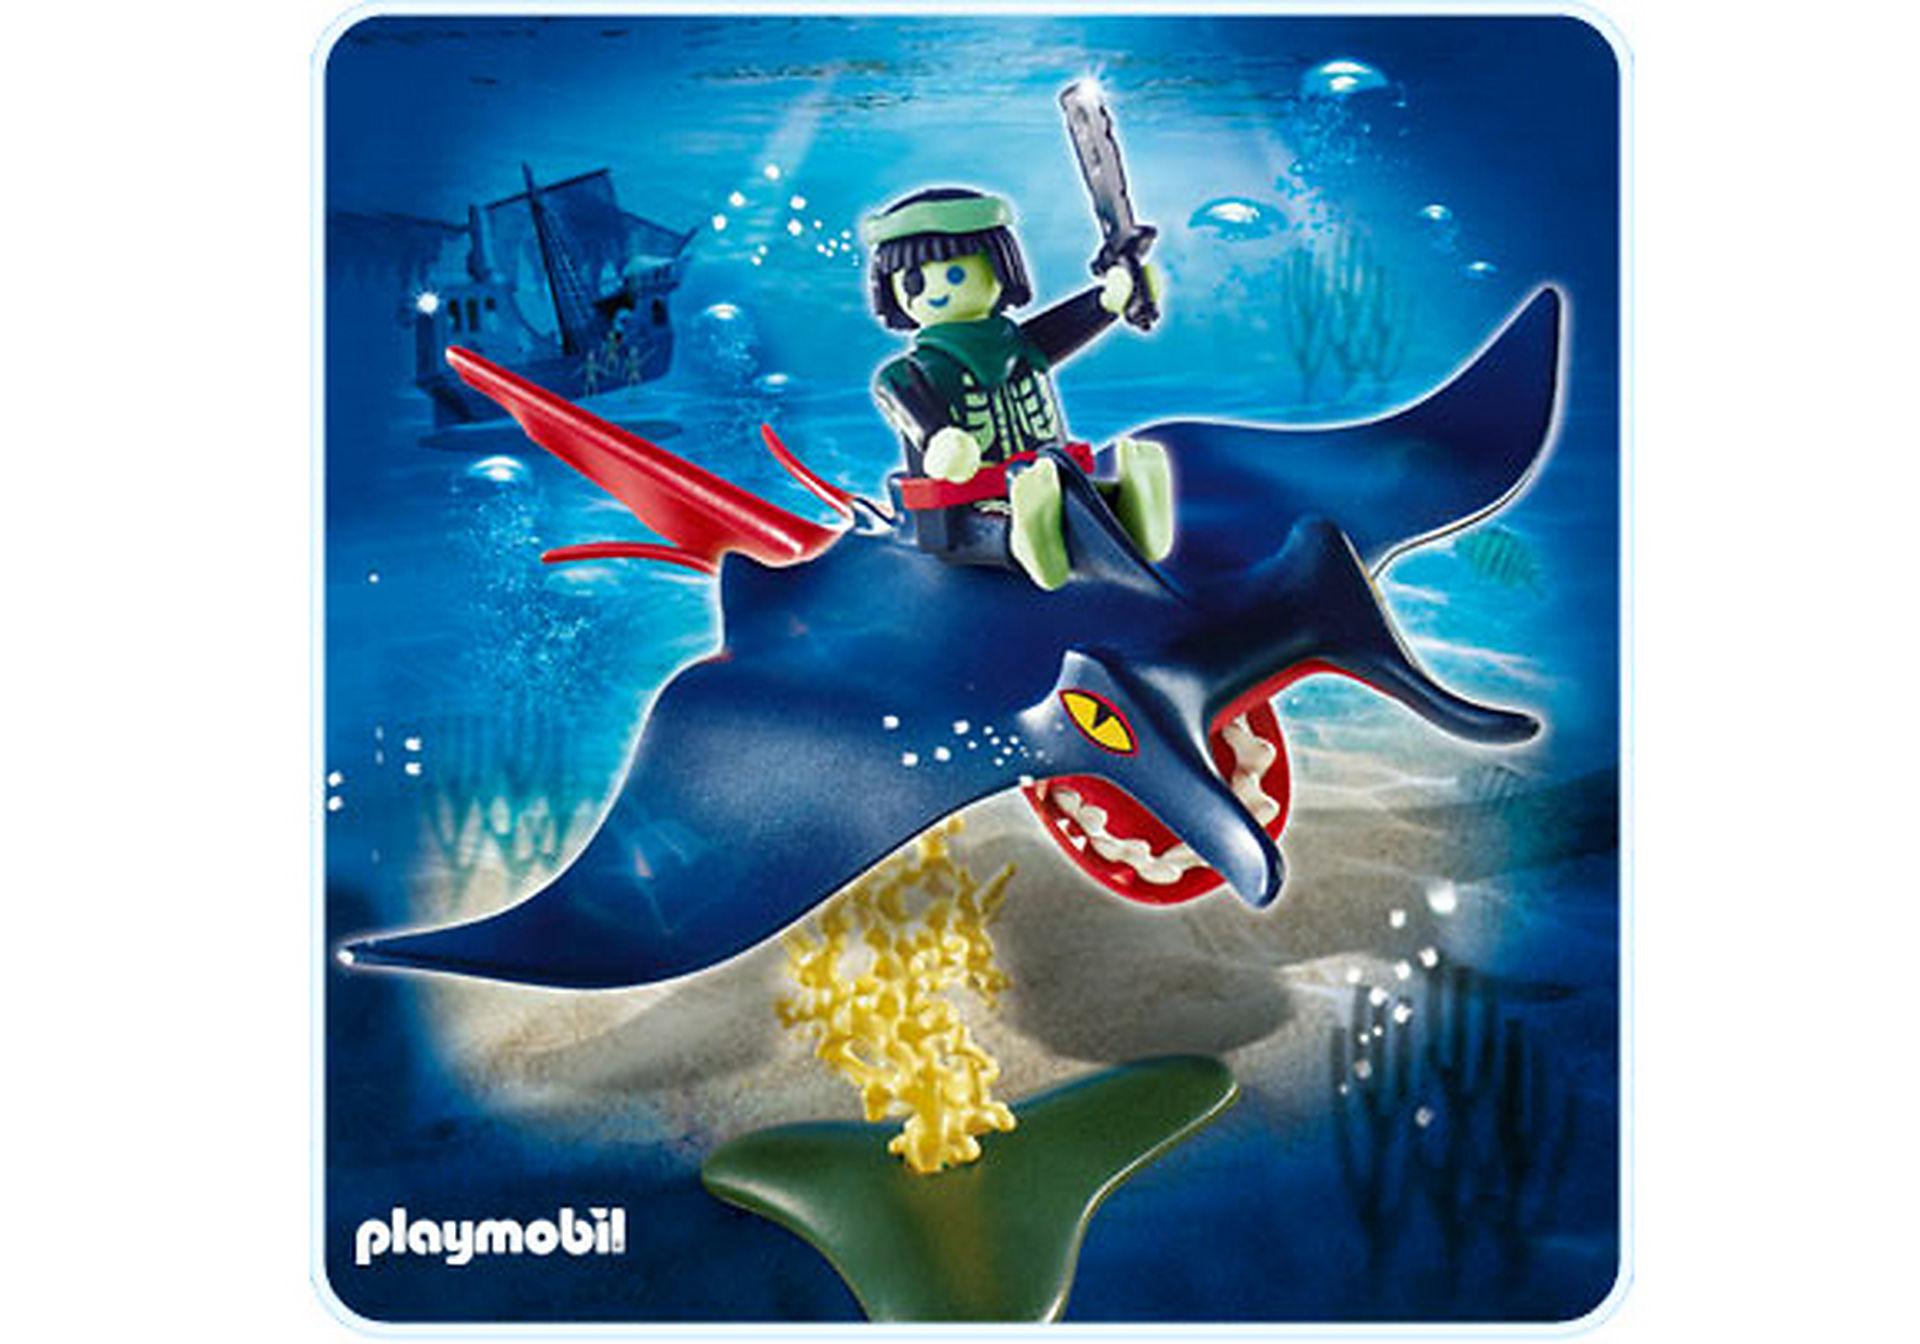 http://media.playmobil.com/i/playmobil/4801-A_product_detail/Rochenreiter